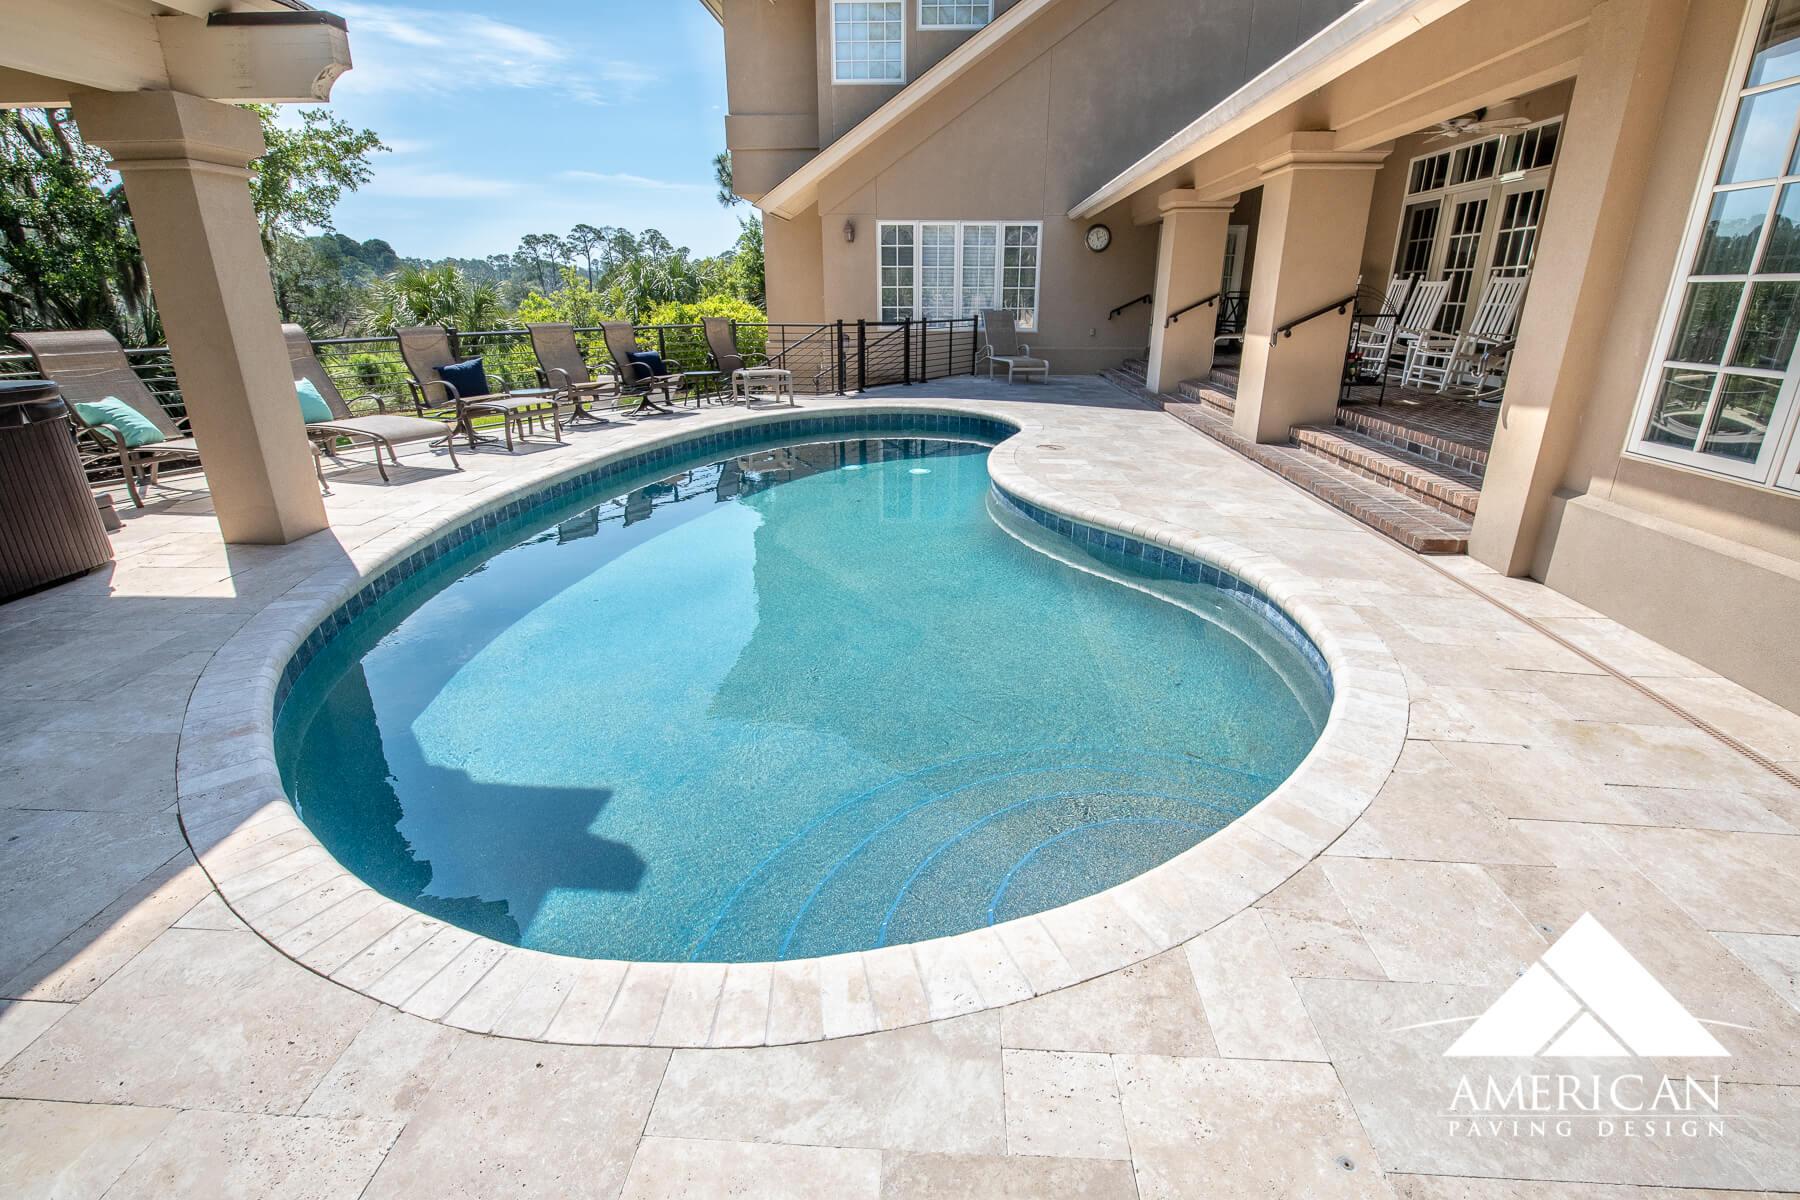 Pool Deck Travertine - Savannah, GA